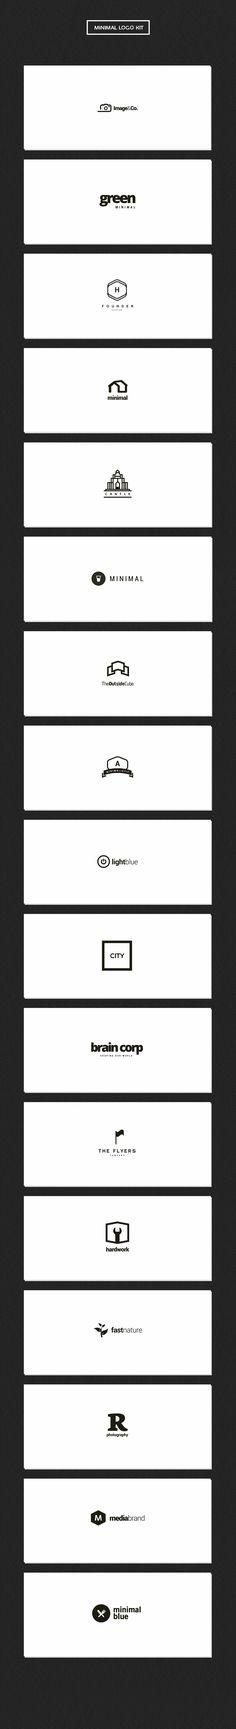 Minimal Logo Kit by DesignDistrict on @creativemarket